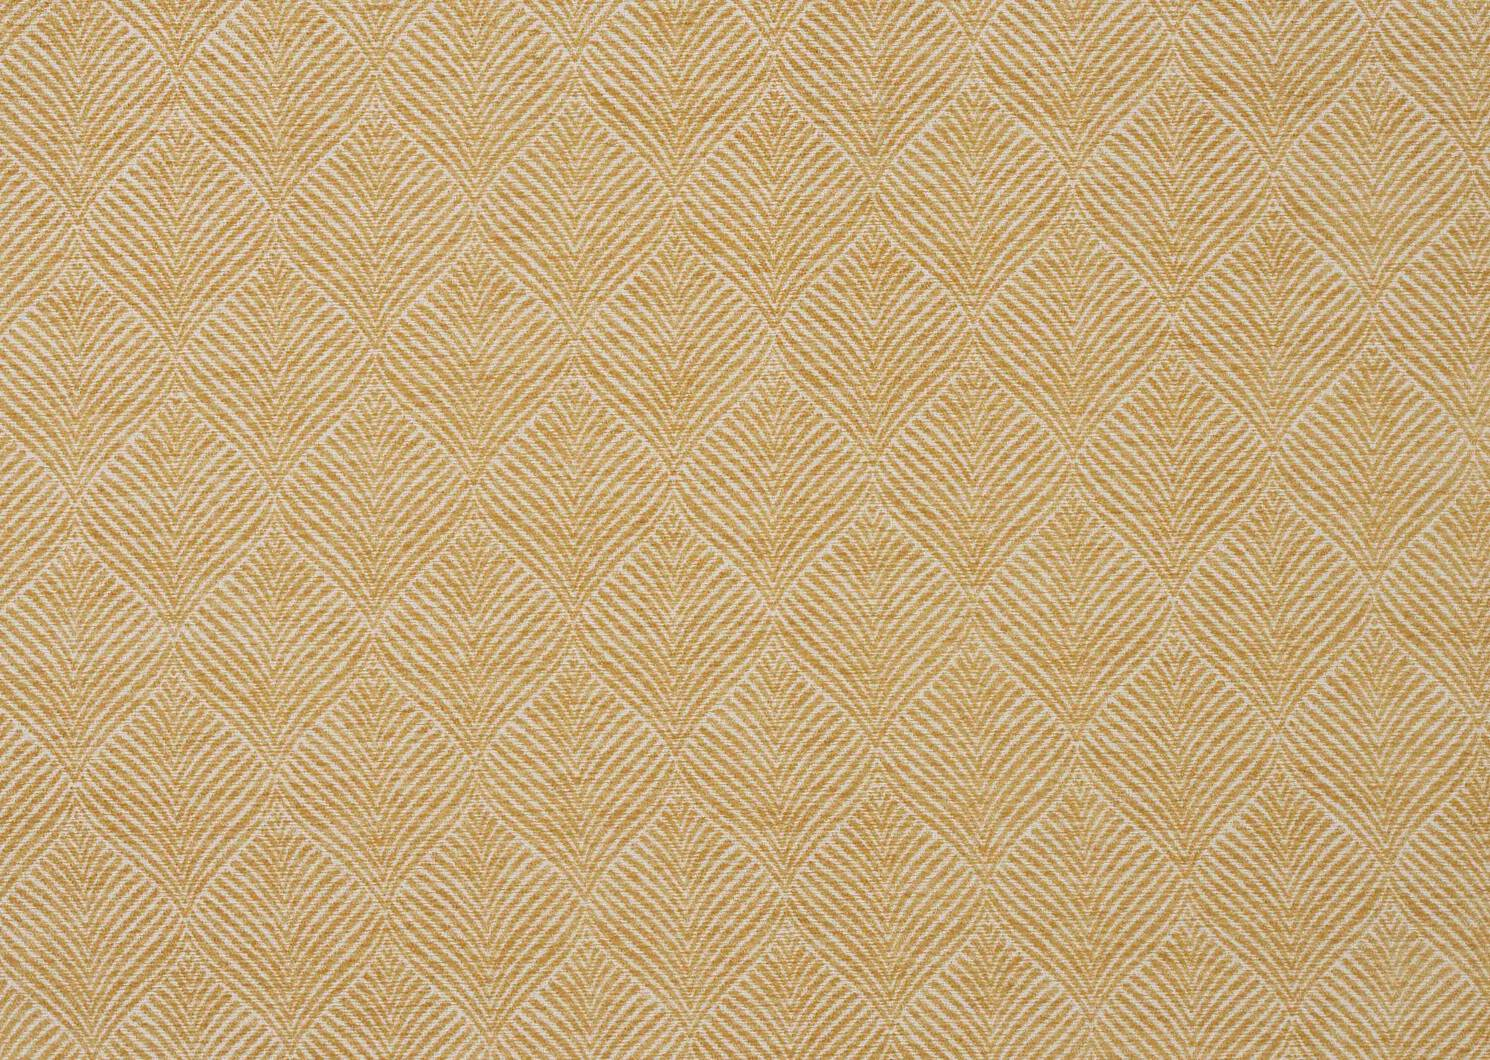 Rideau Larson 96 champ doré/blanc